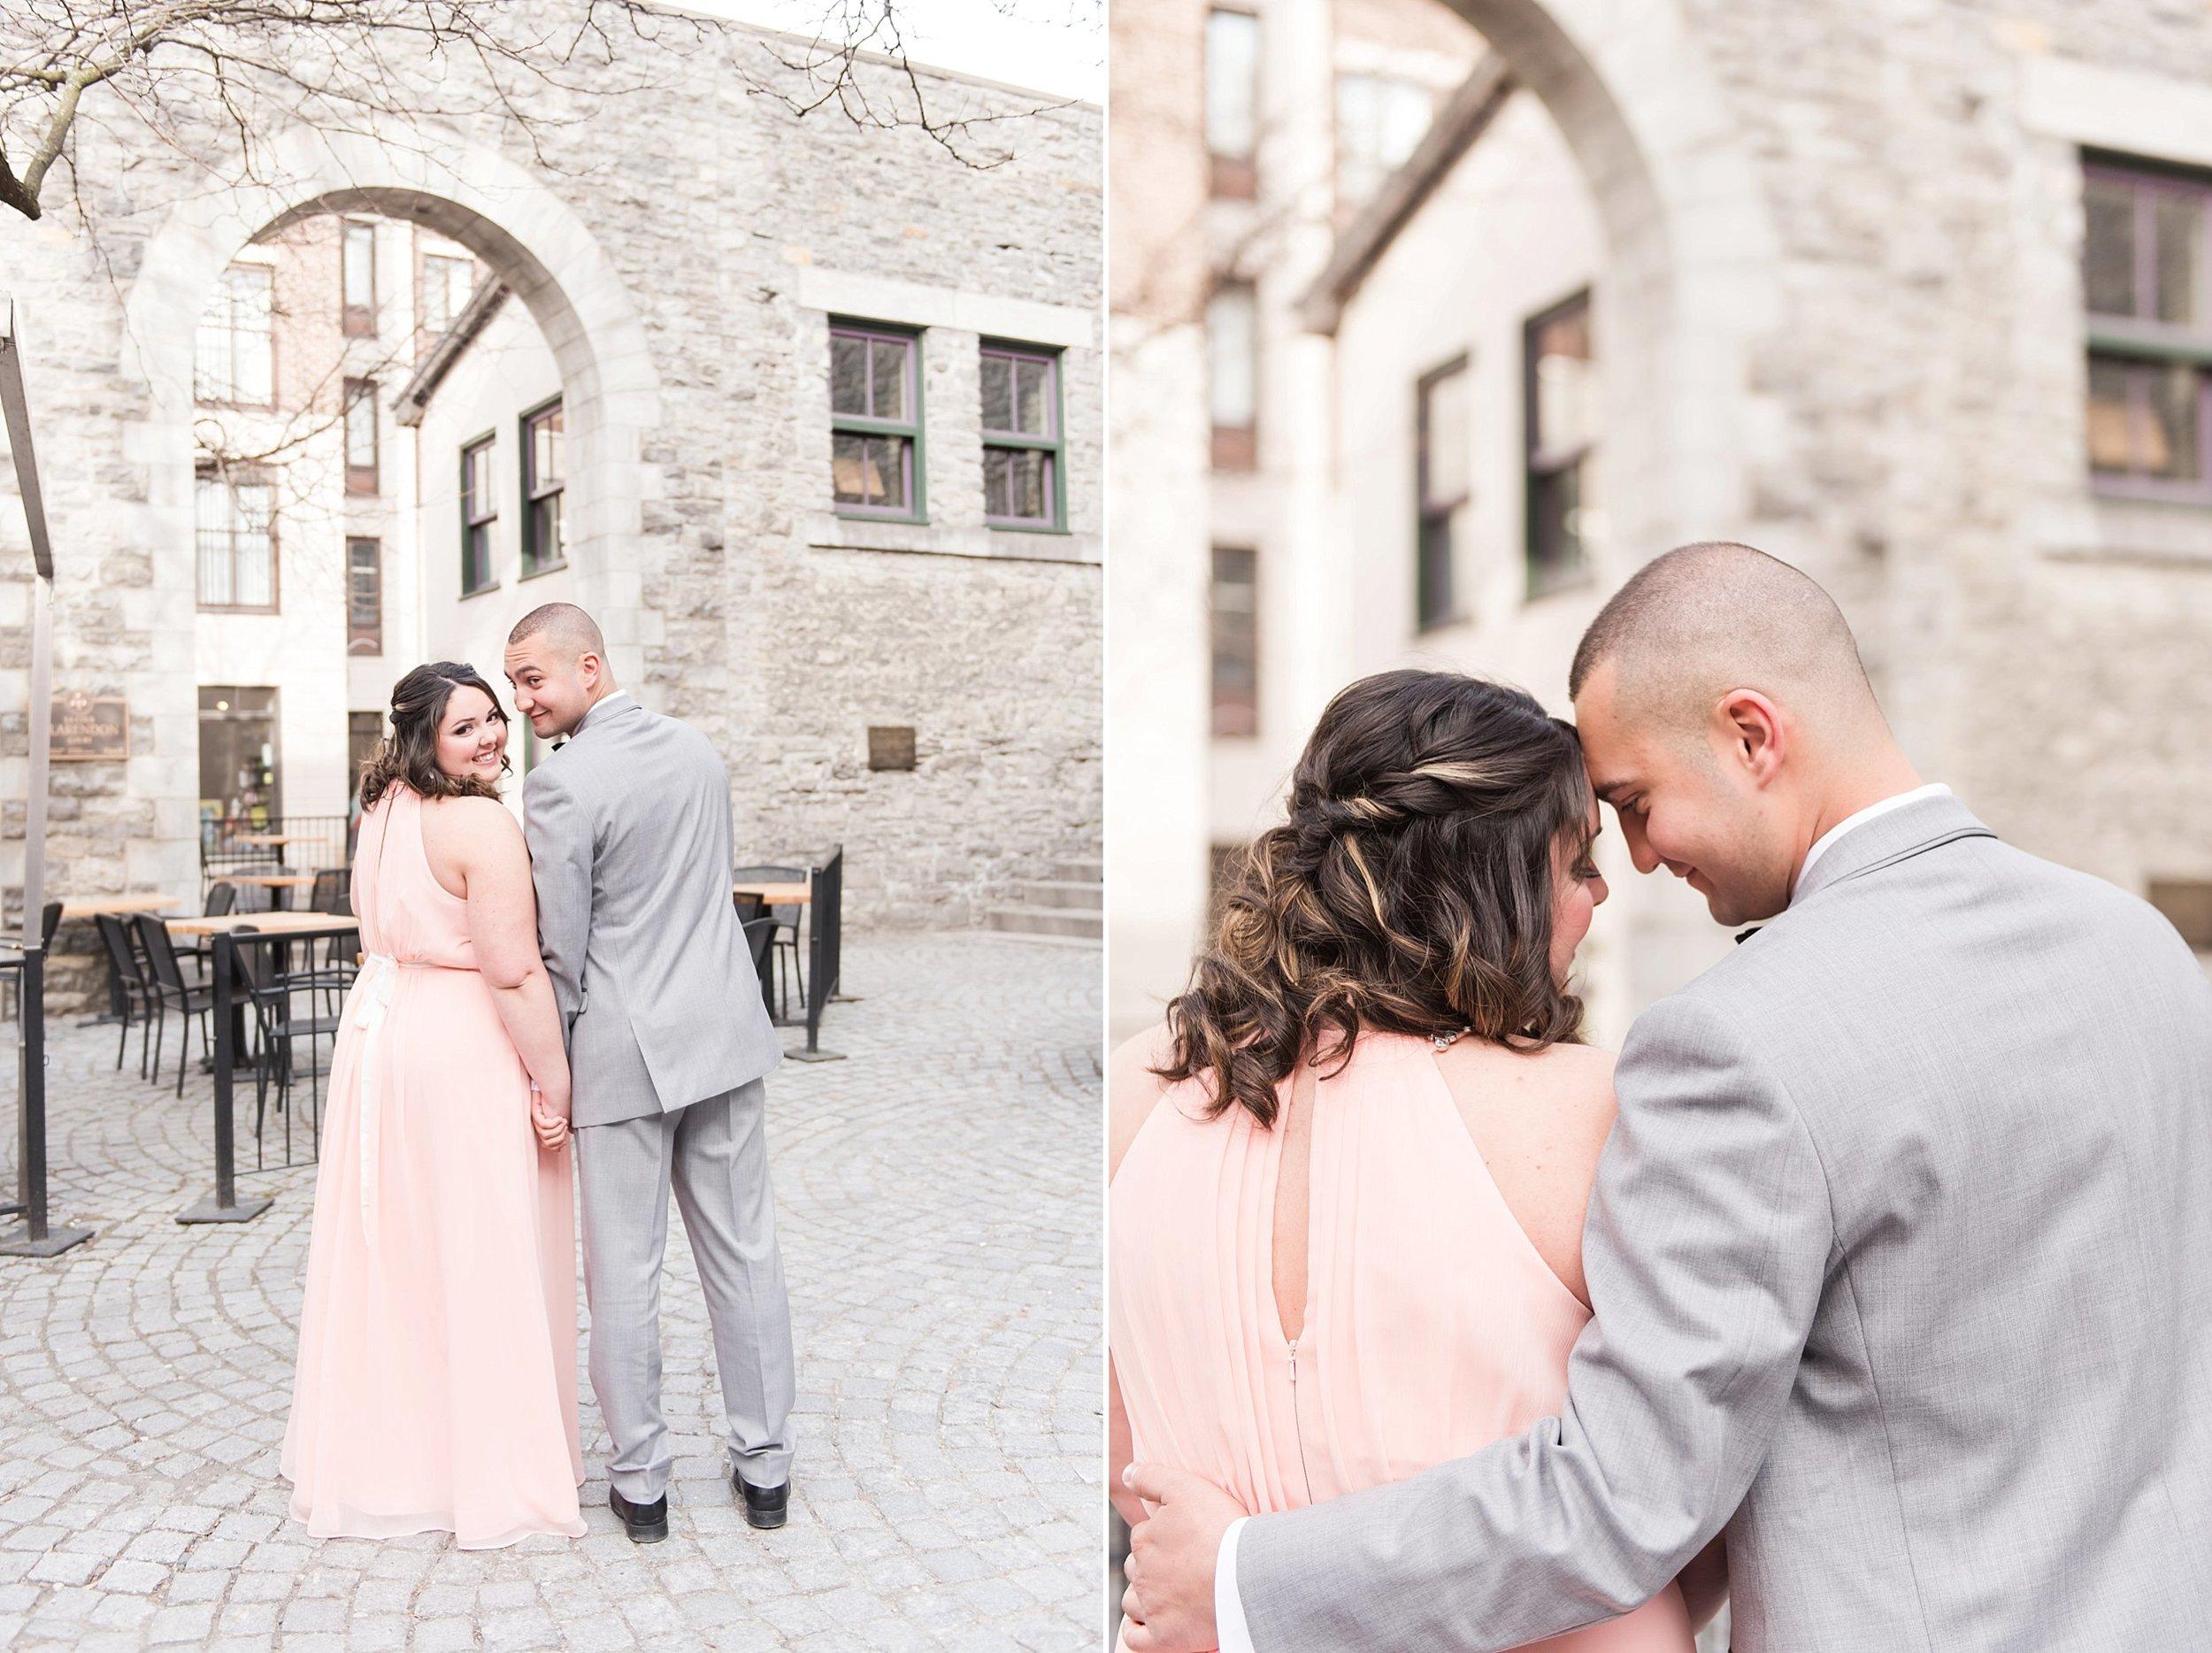 Sarmad Ashley Engagement Shoot- Ali Batoul Creatives Fine Art Wedding Photography_0062.jpg